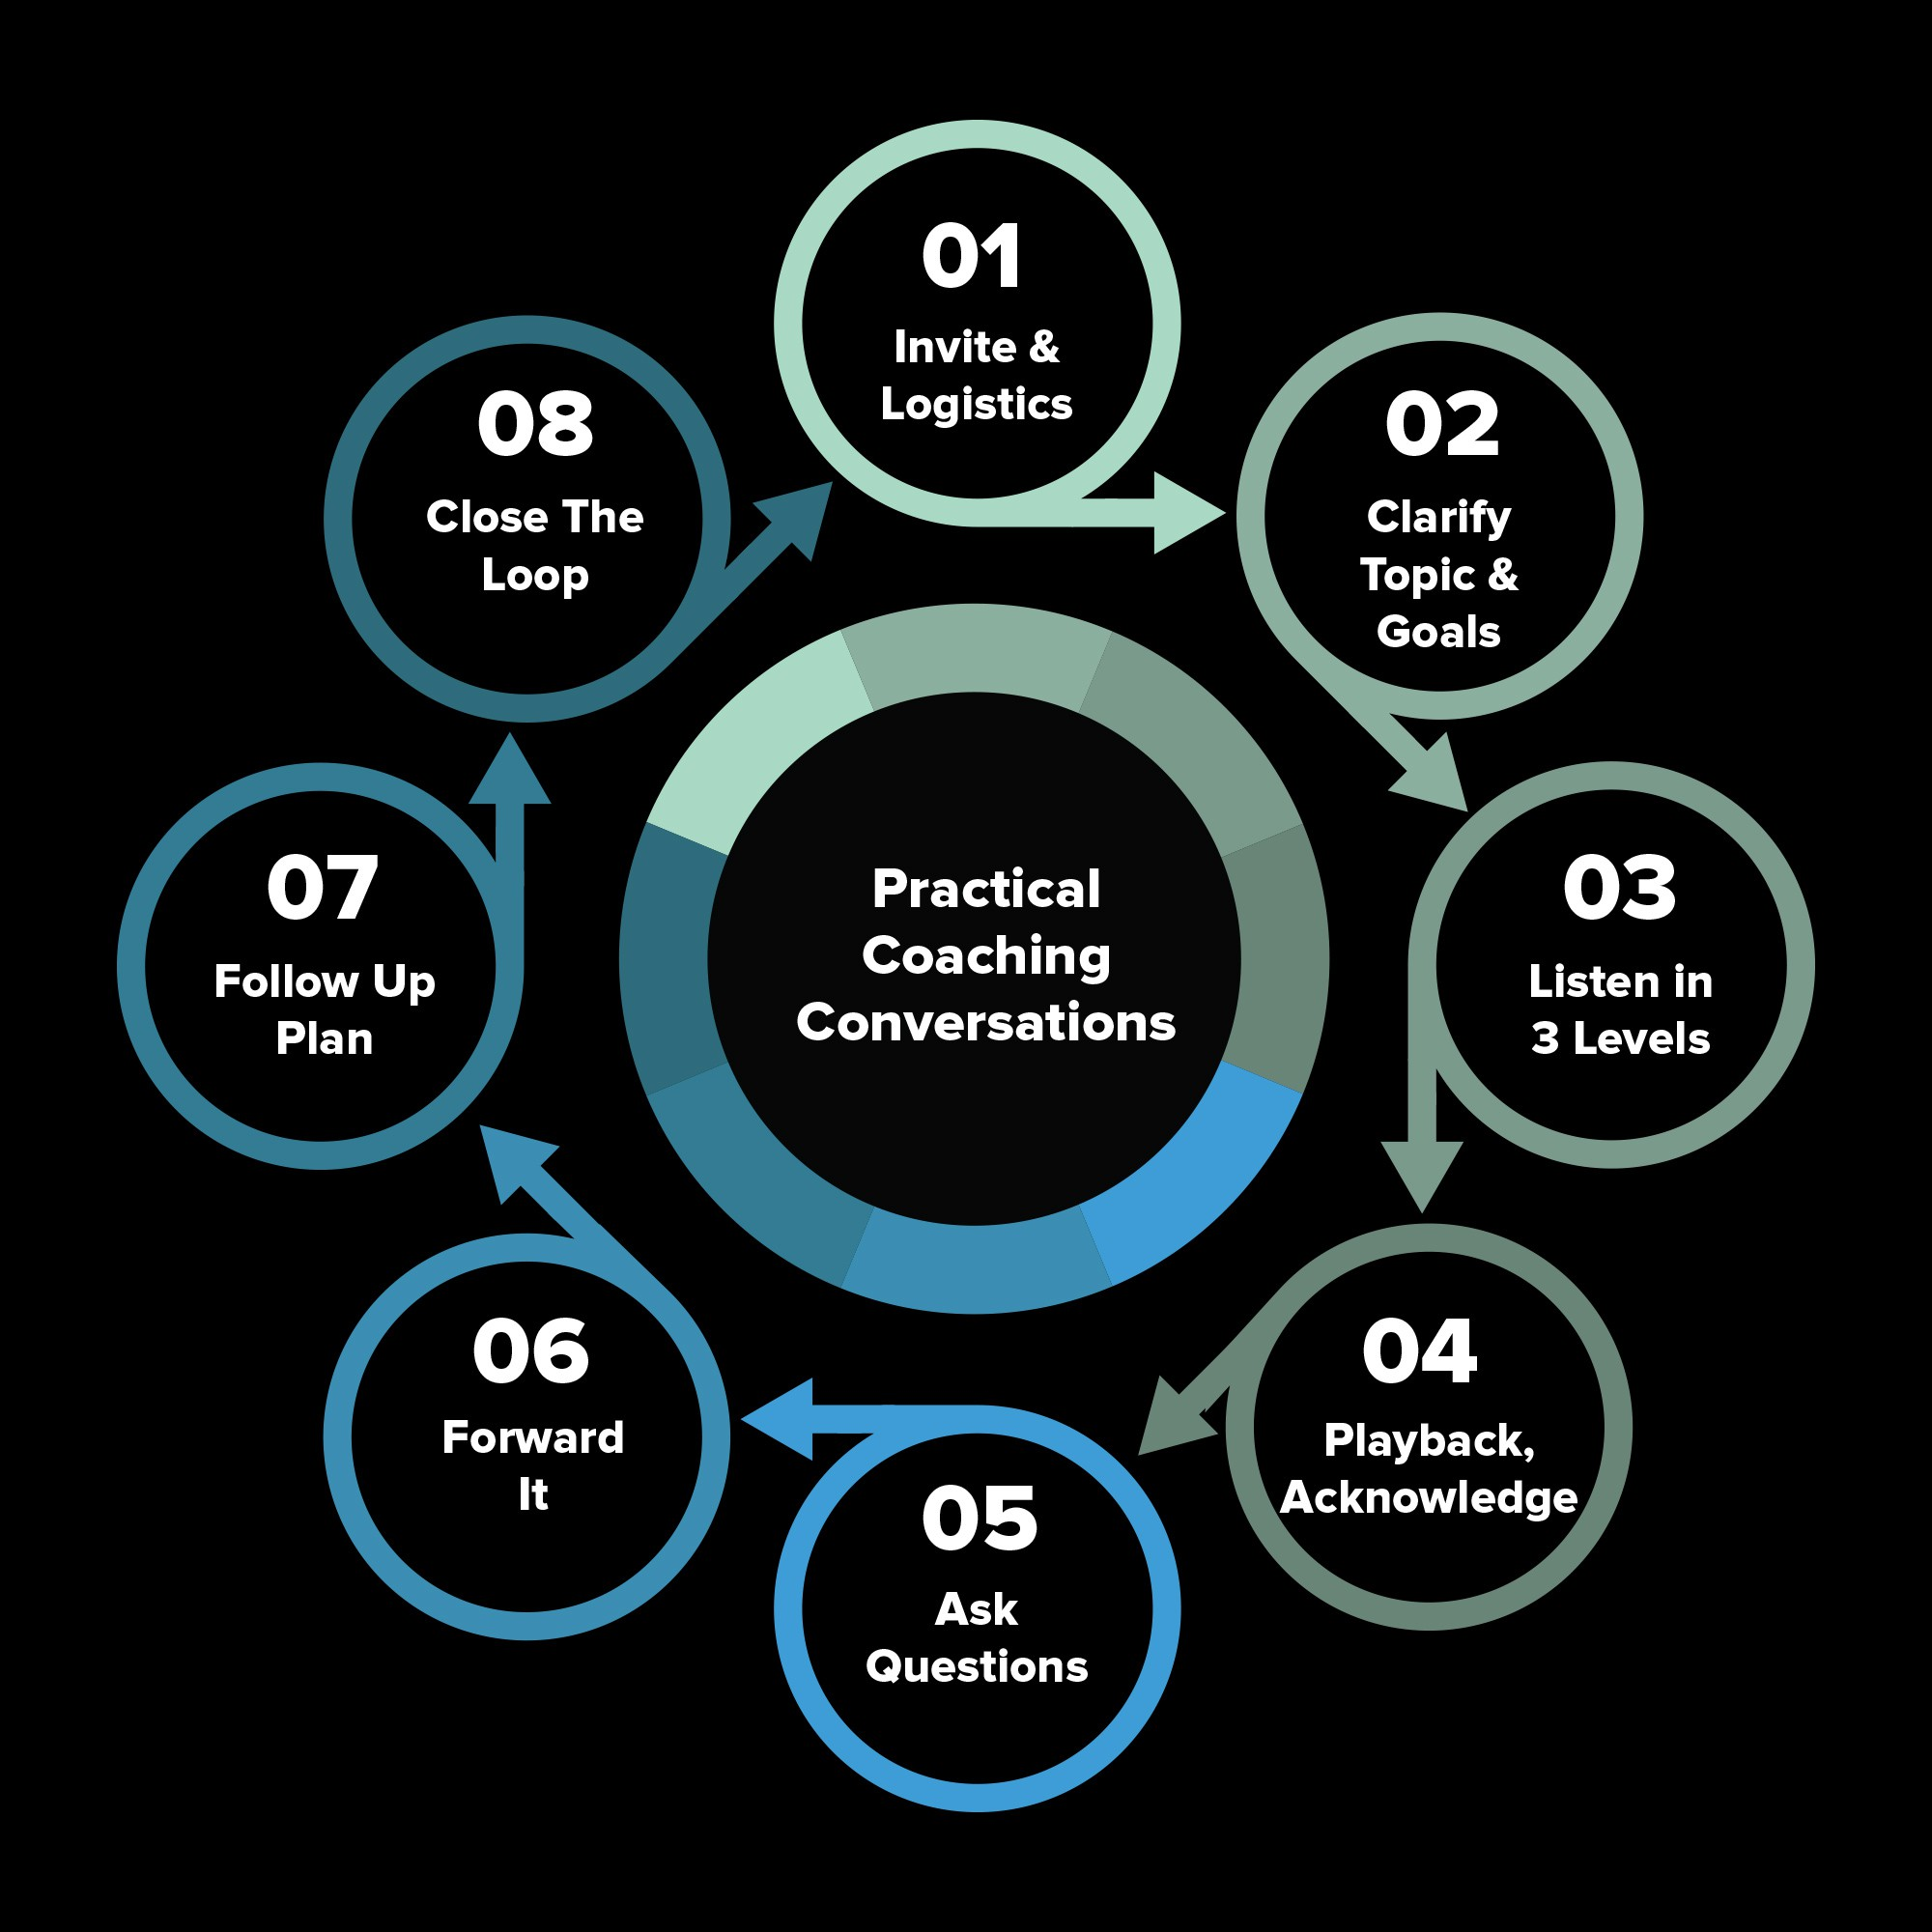 Practical coaching conversations image design